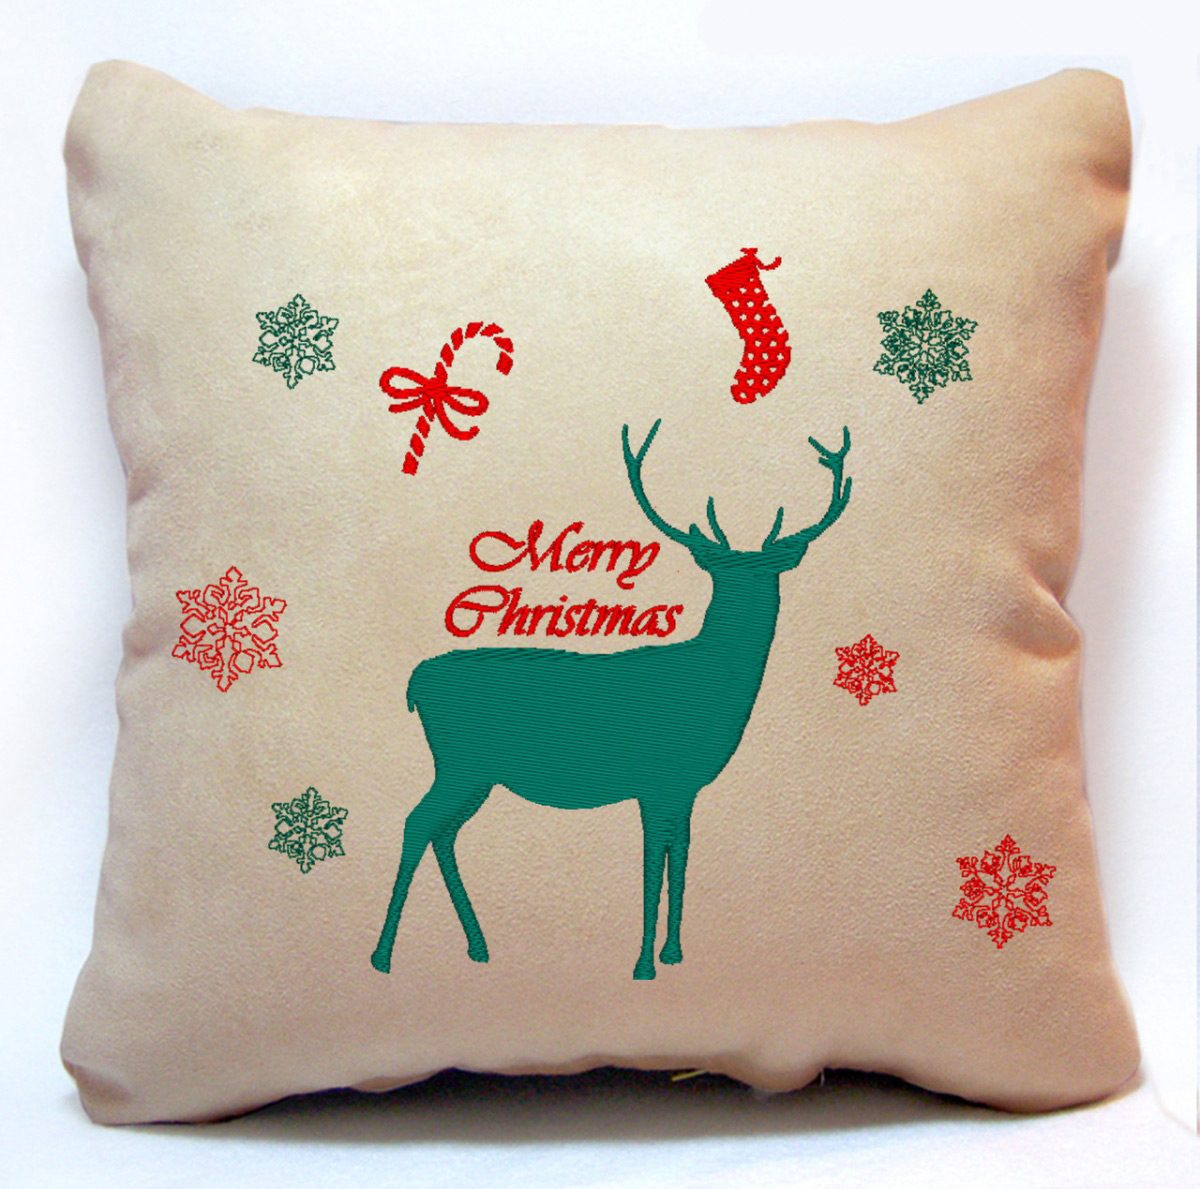 Новогодняя подушка Merry Christmas 26 Slivki бежевый